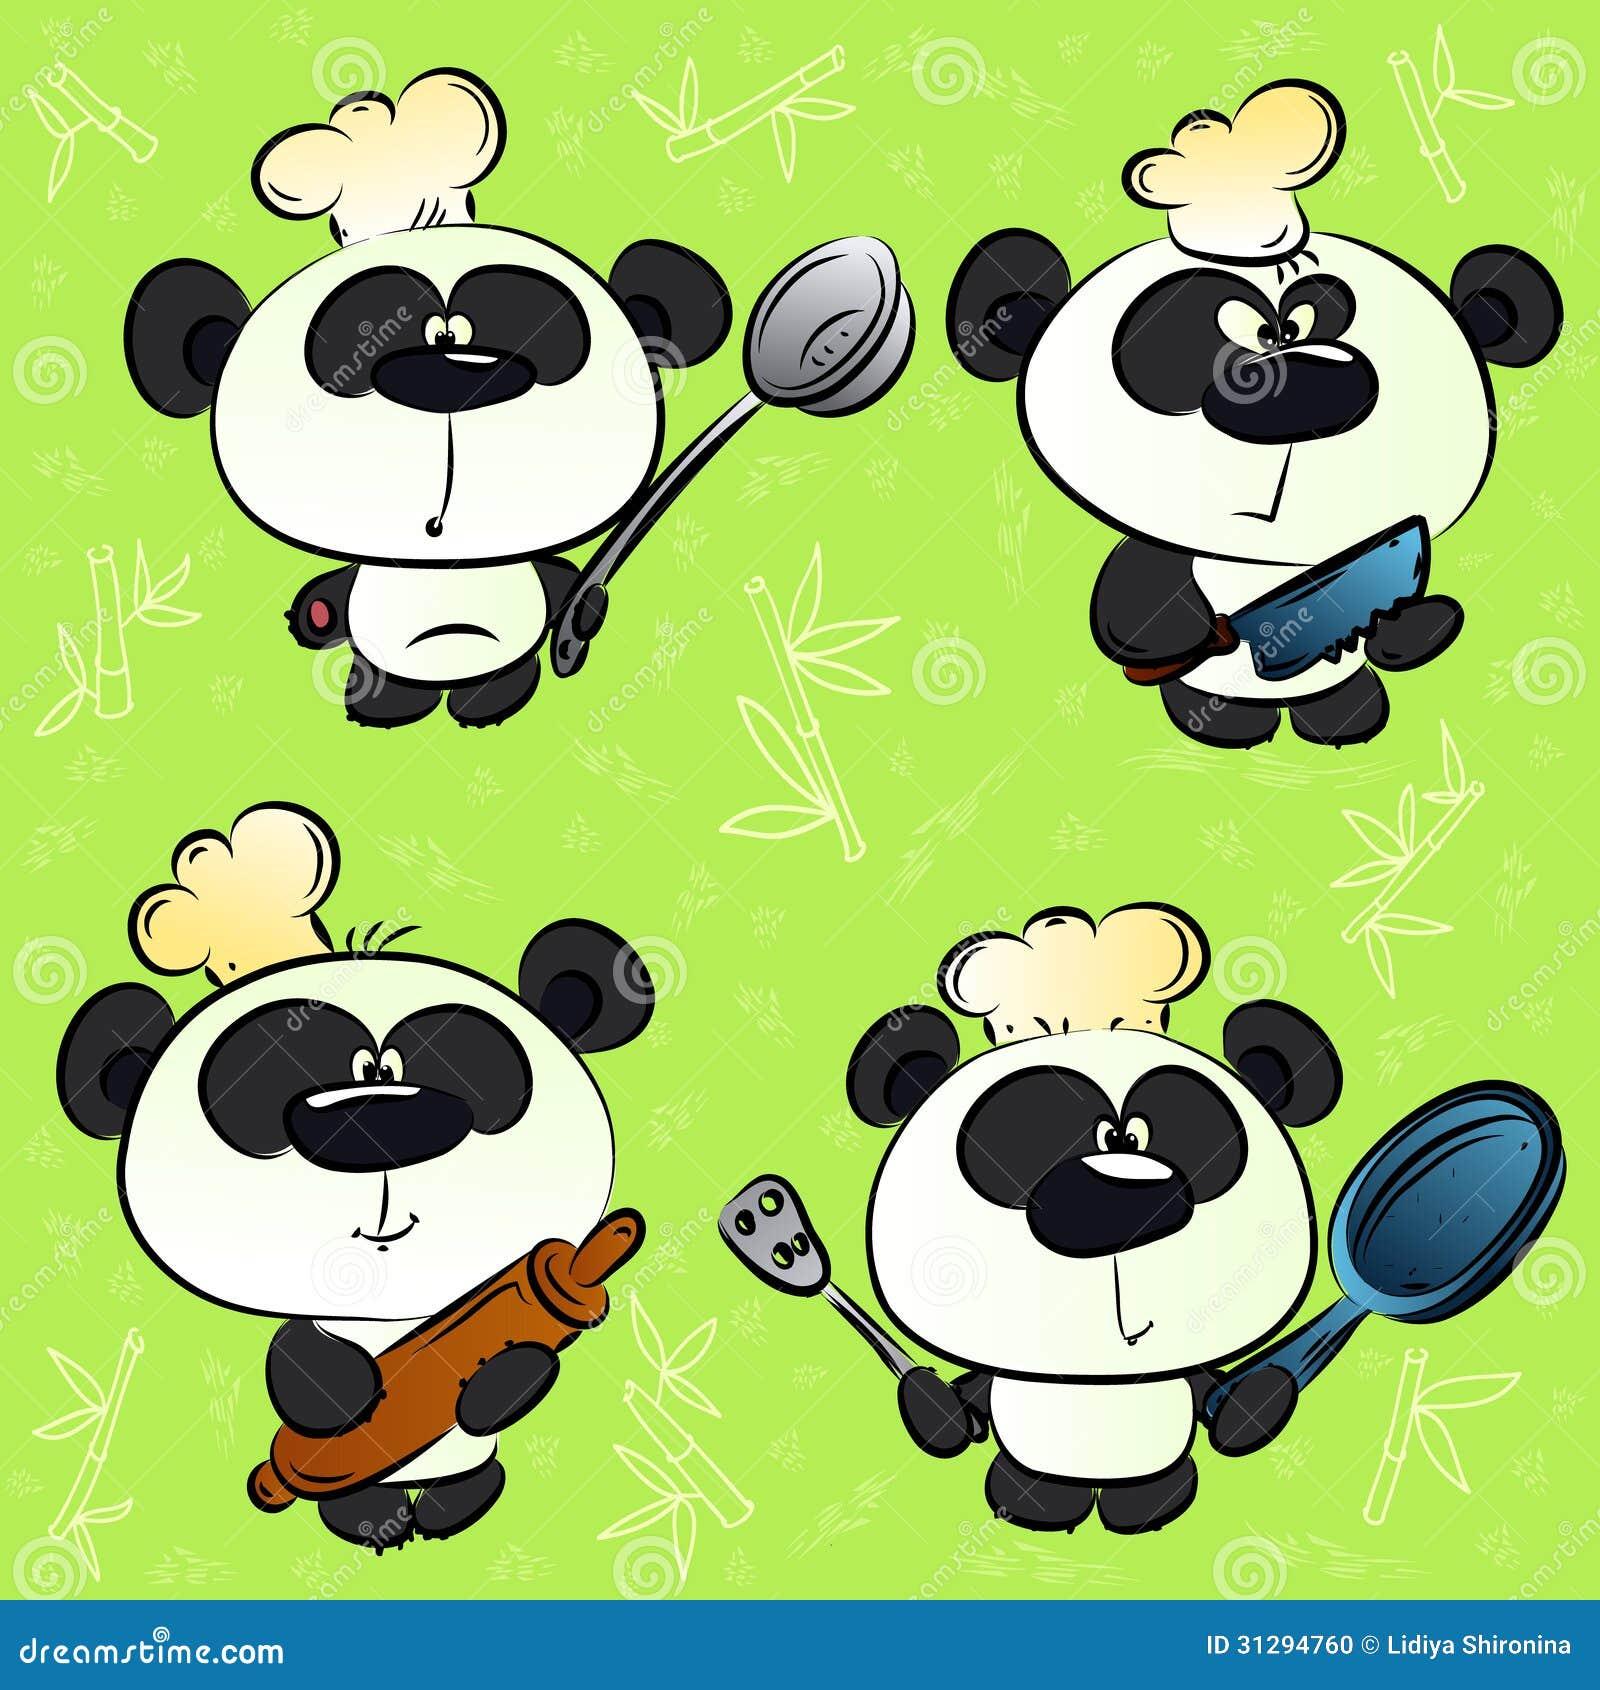 Panda Chef Stock Illustration. Image Of Herbivorous